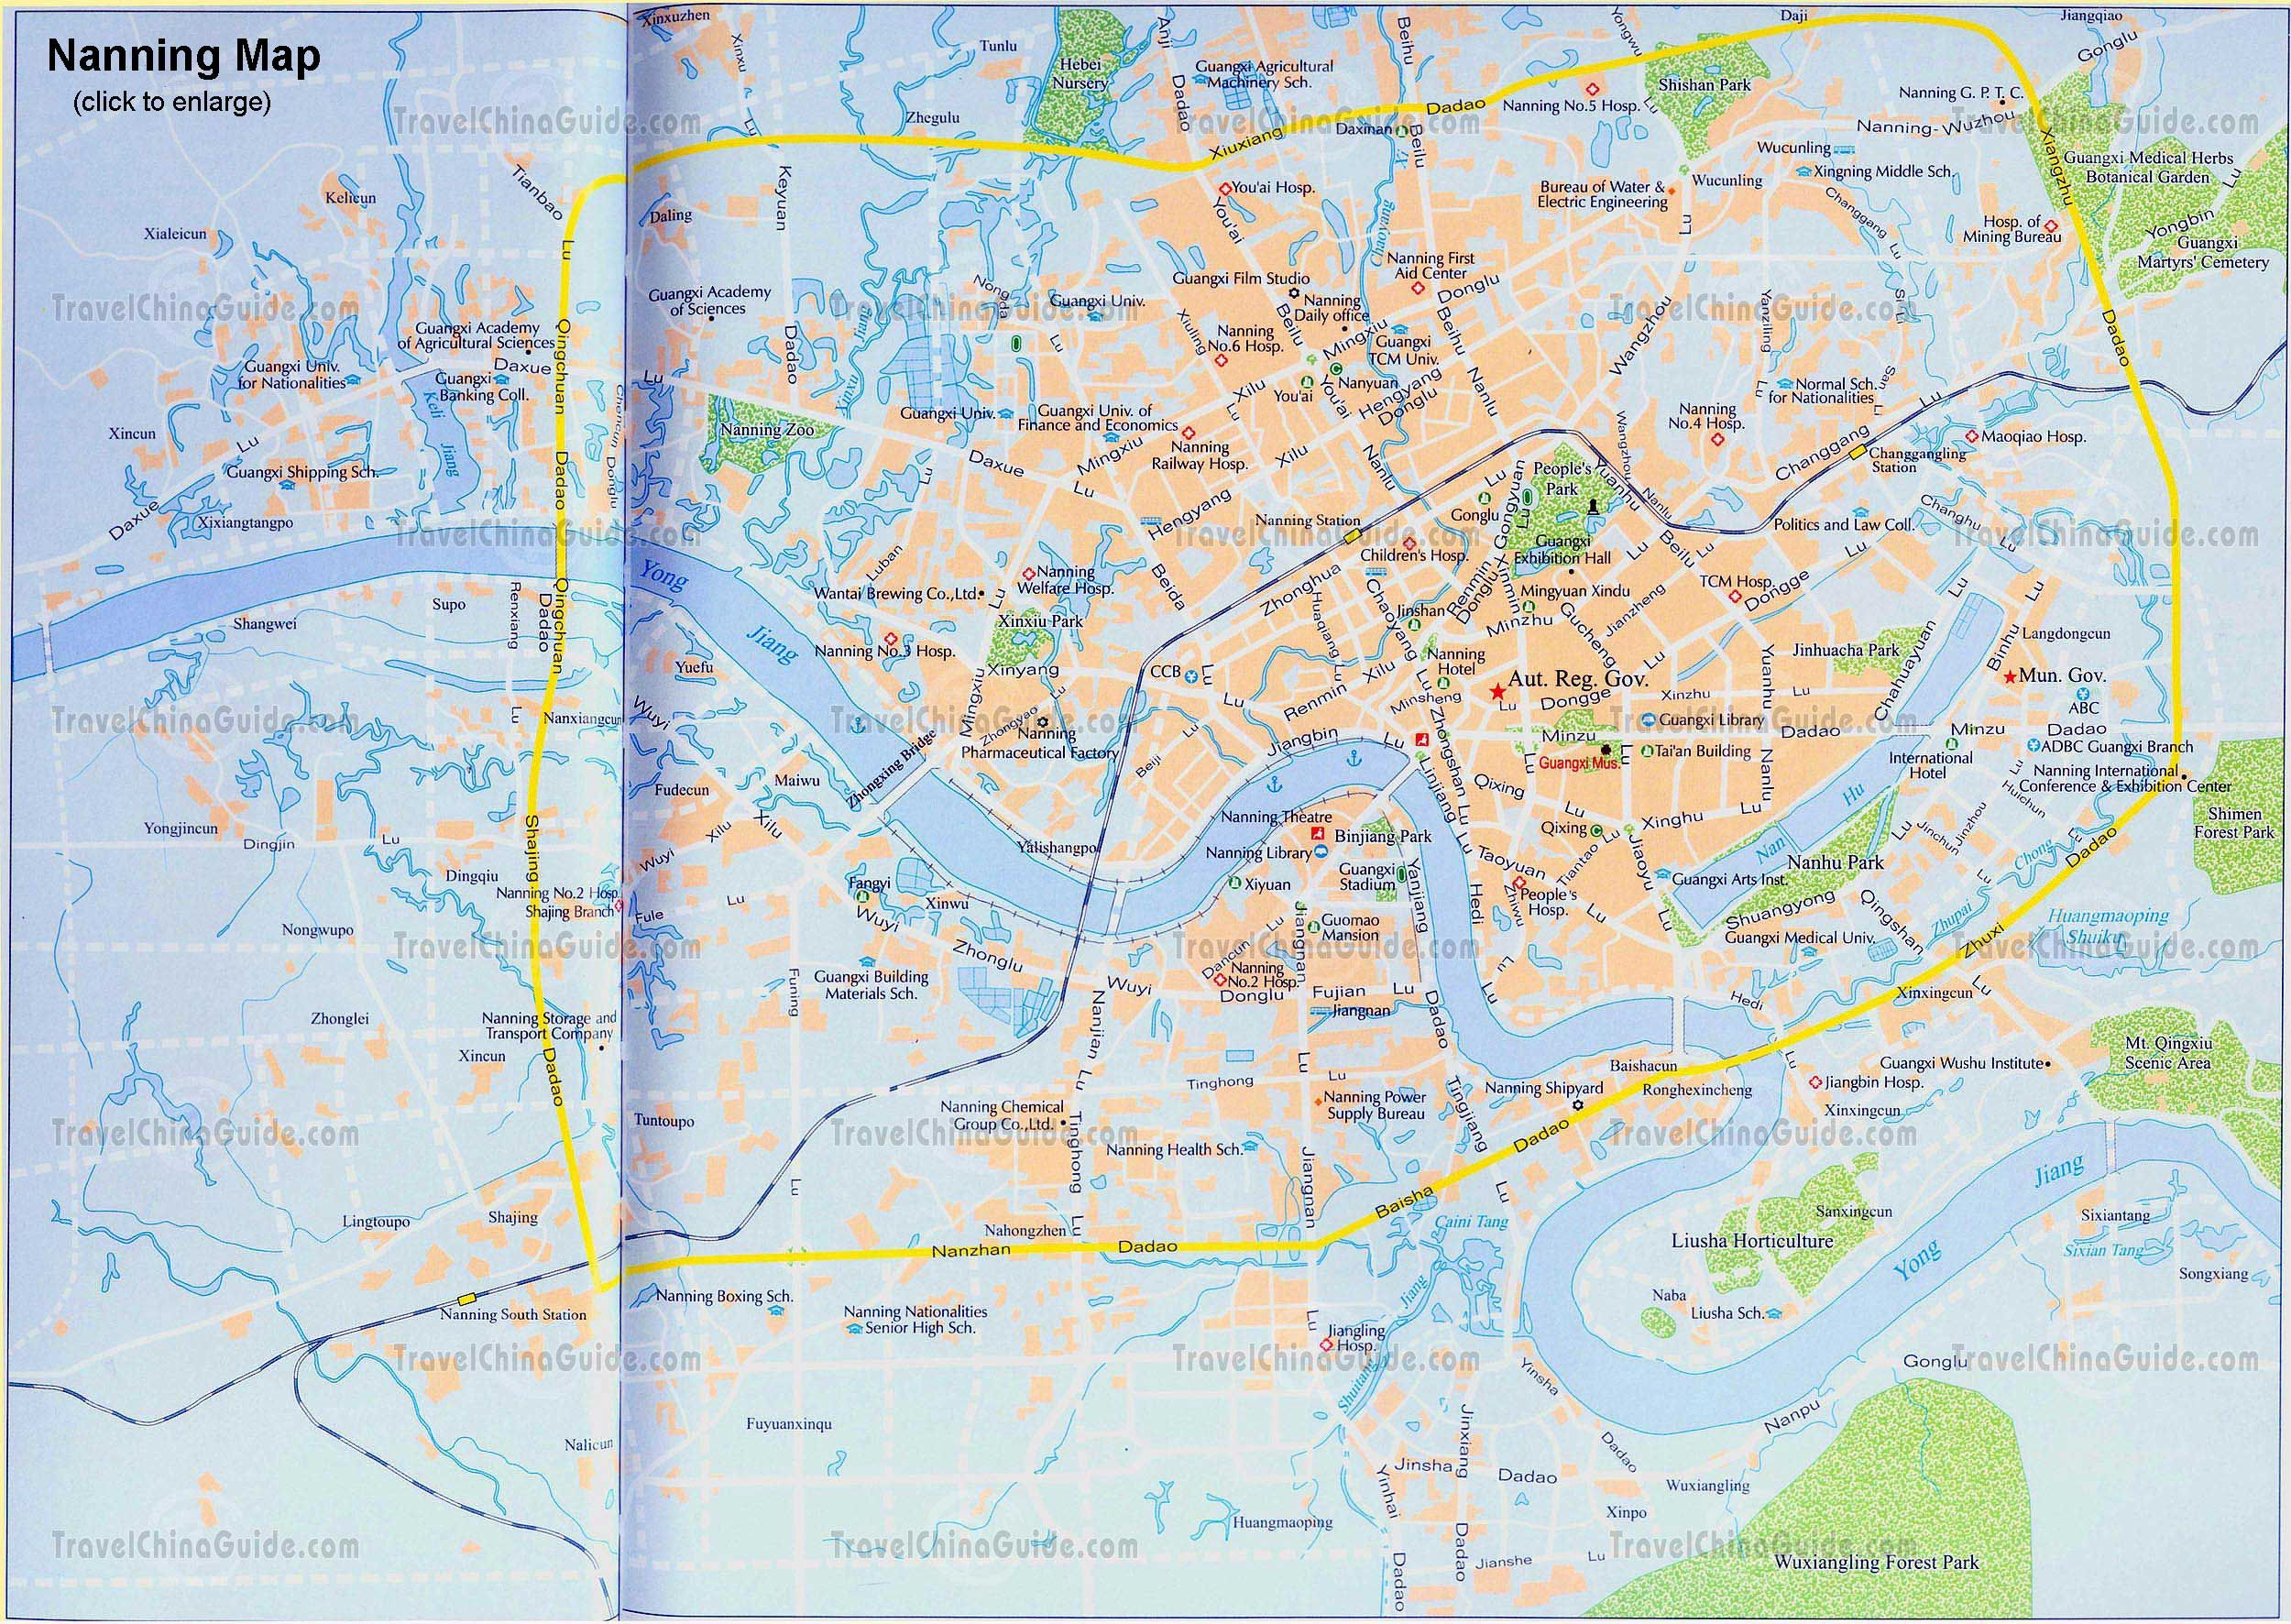 Nanning city map Nanning city map